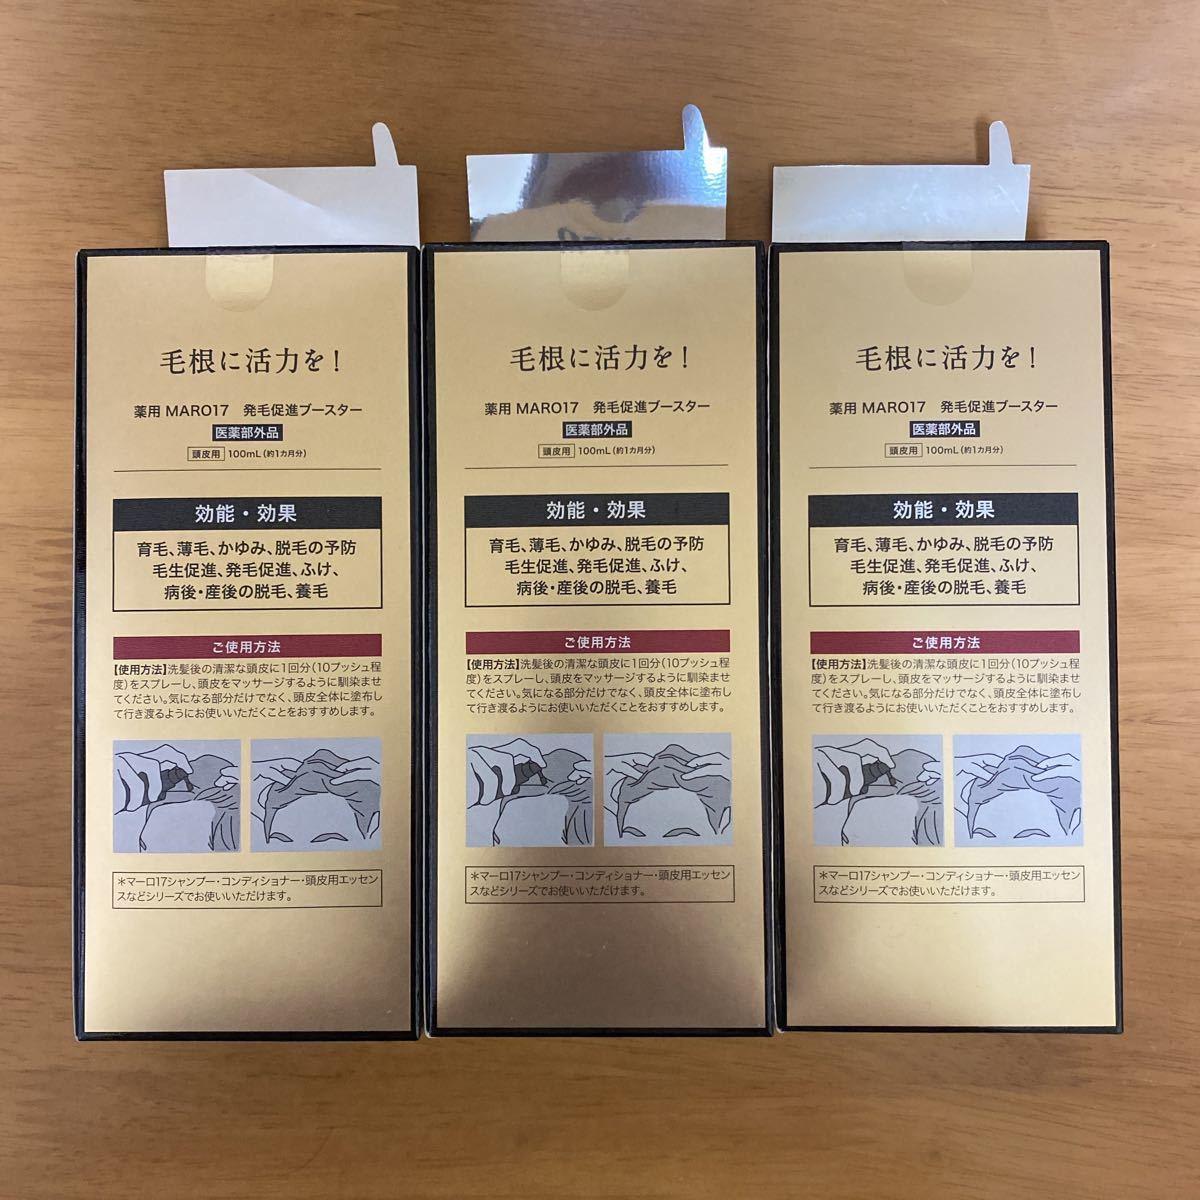 MARO17 マーロ 薬用育毛剤 発毛促進ブースター ×3